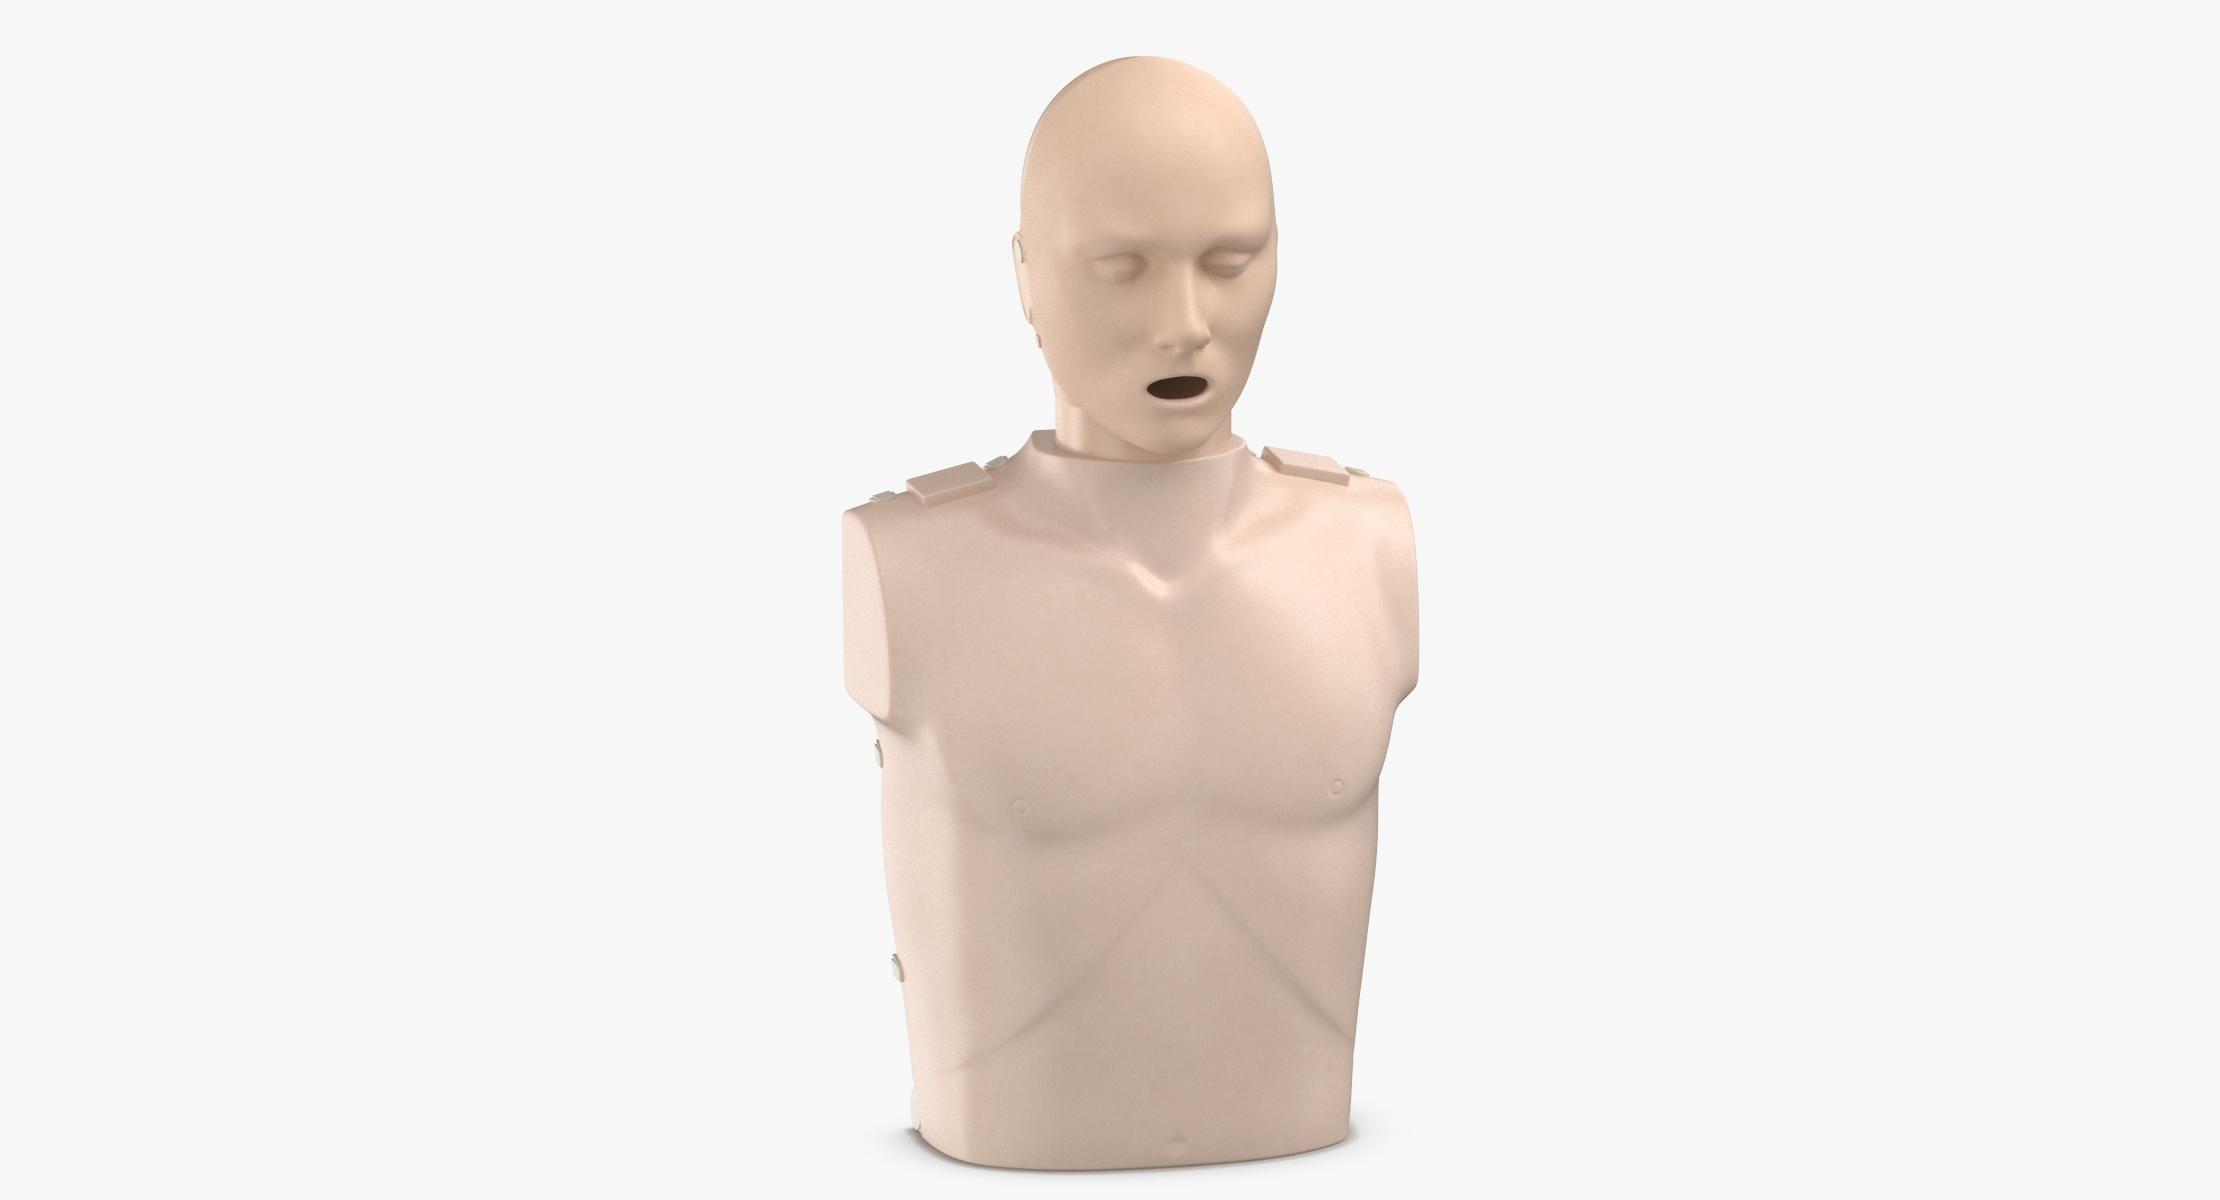 CPR Dummy - reel 1